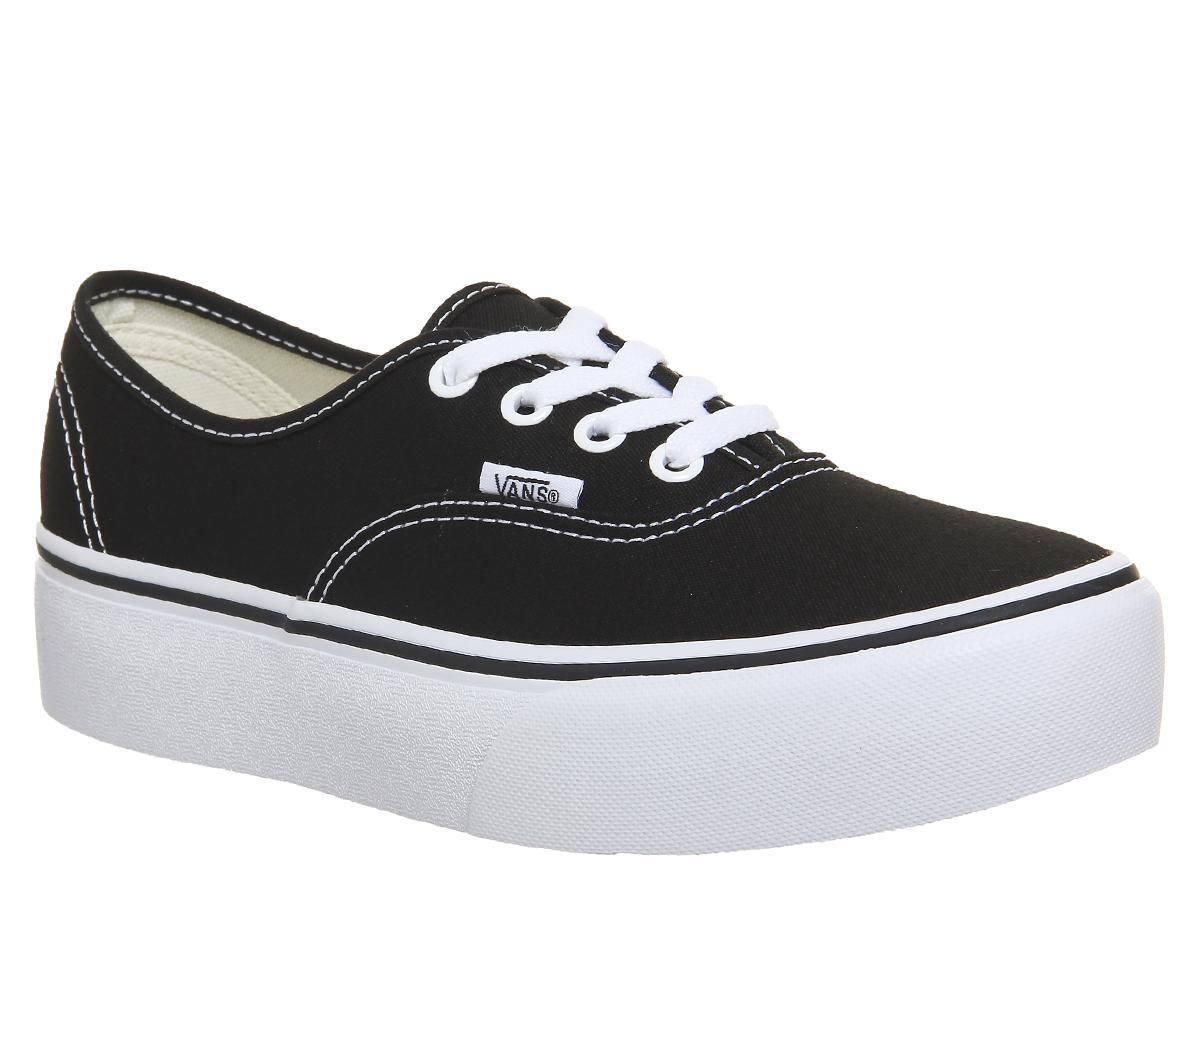 Vans Authentic Platforms Black - Hers